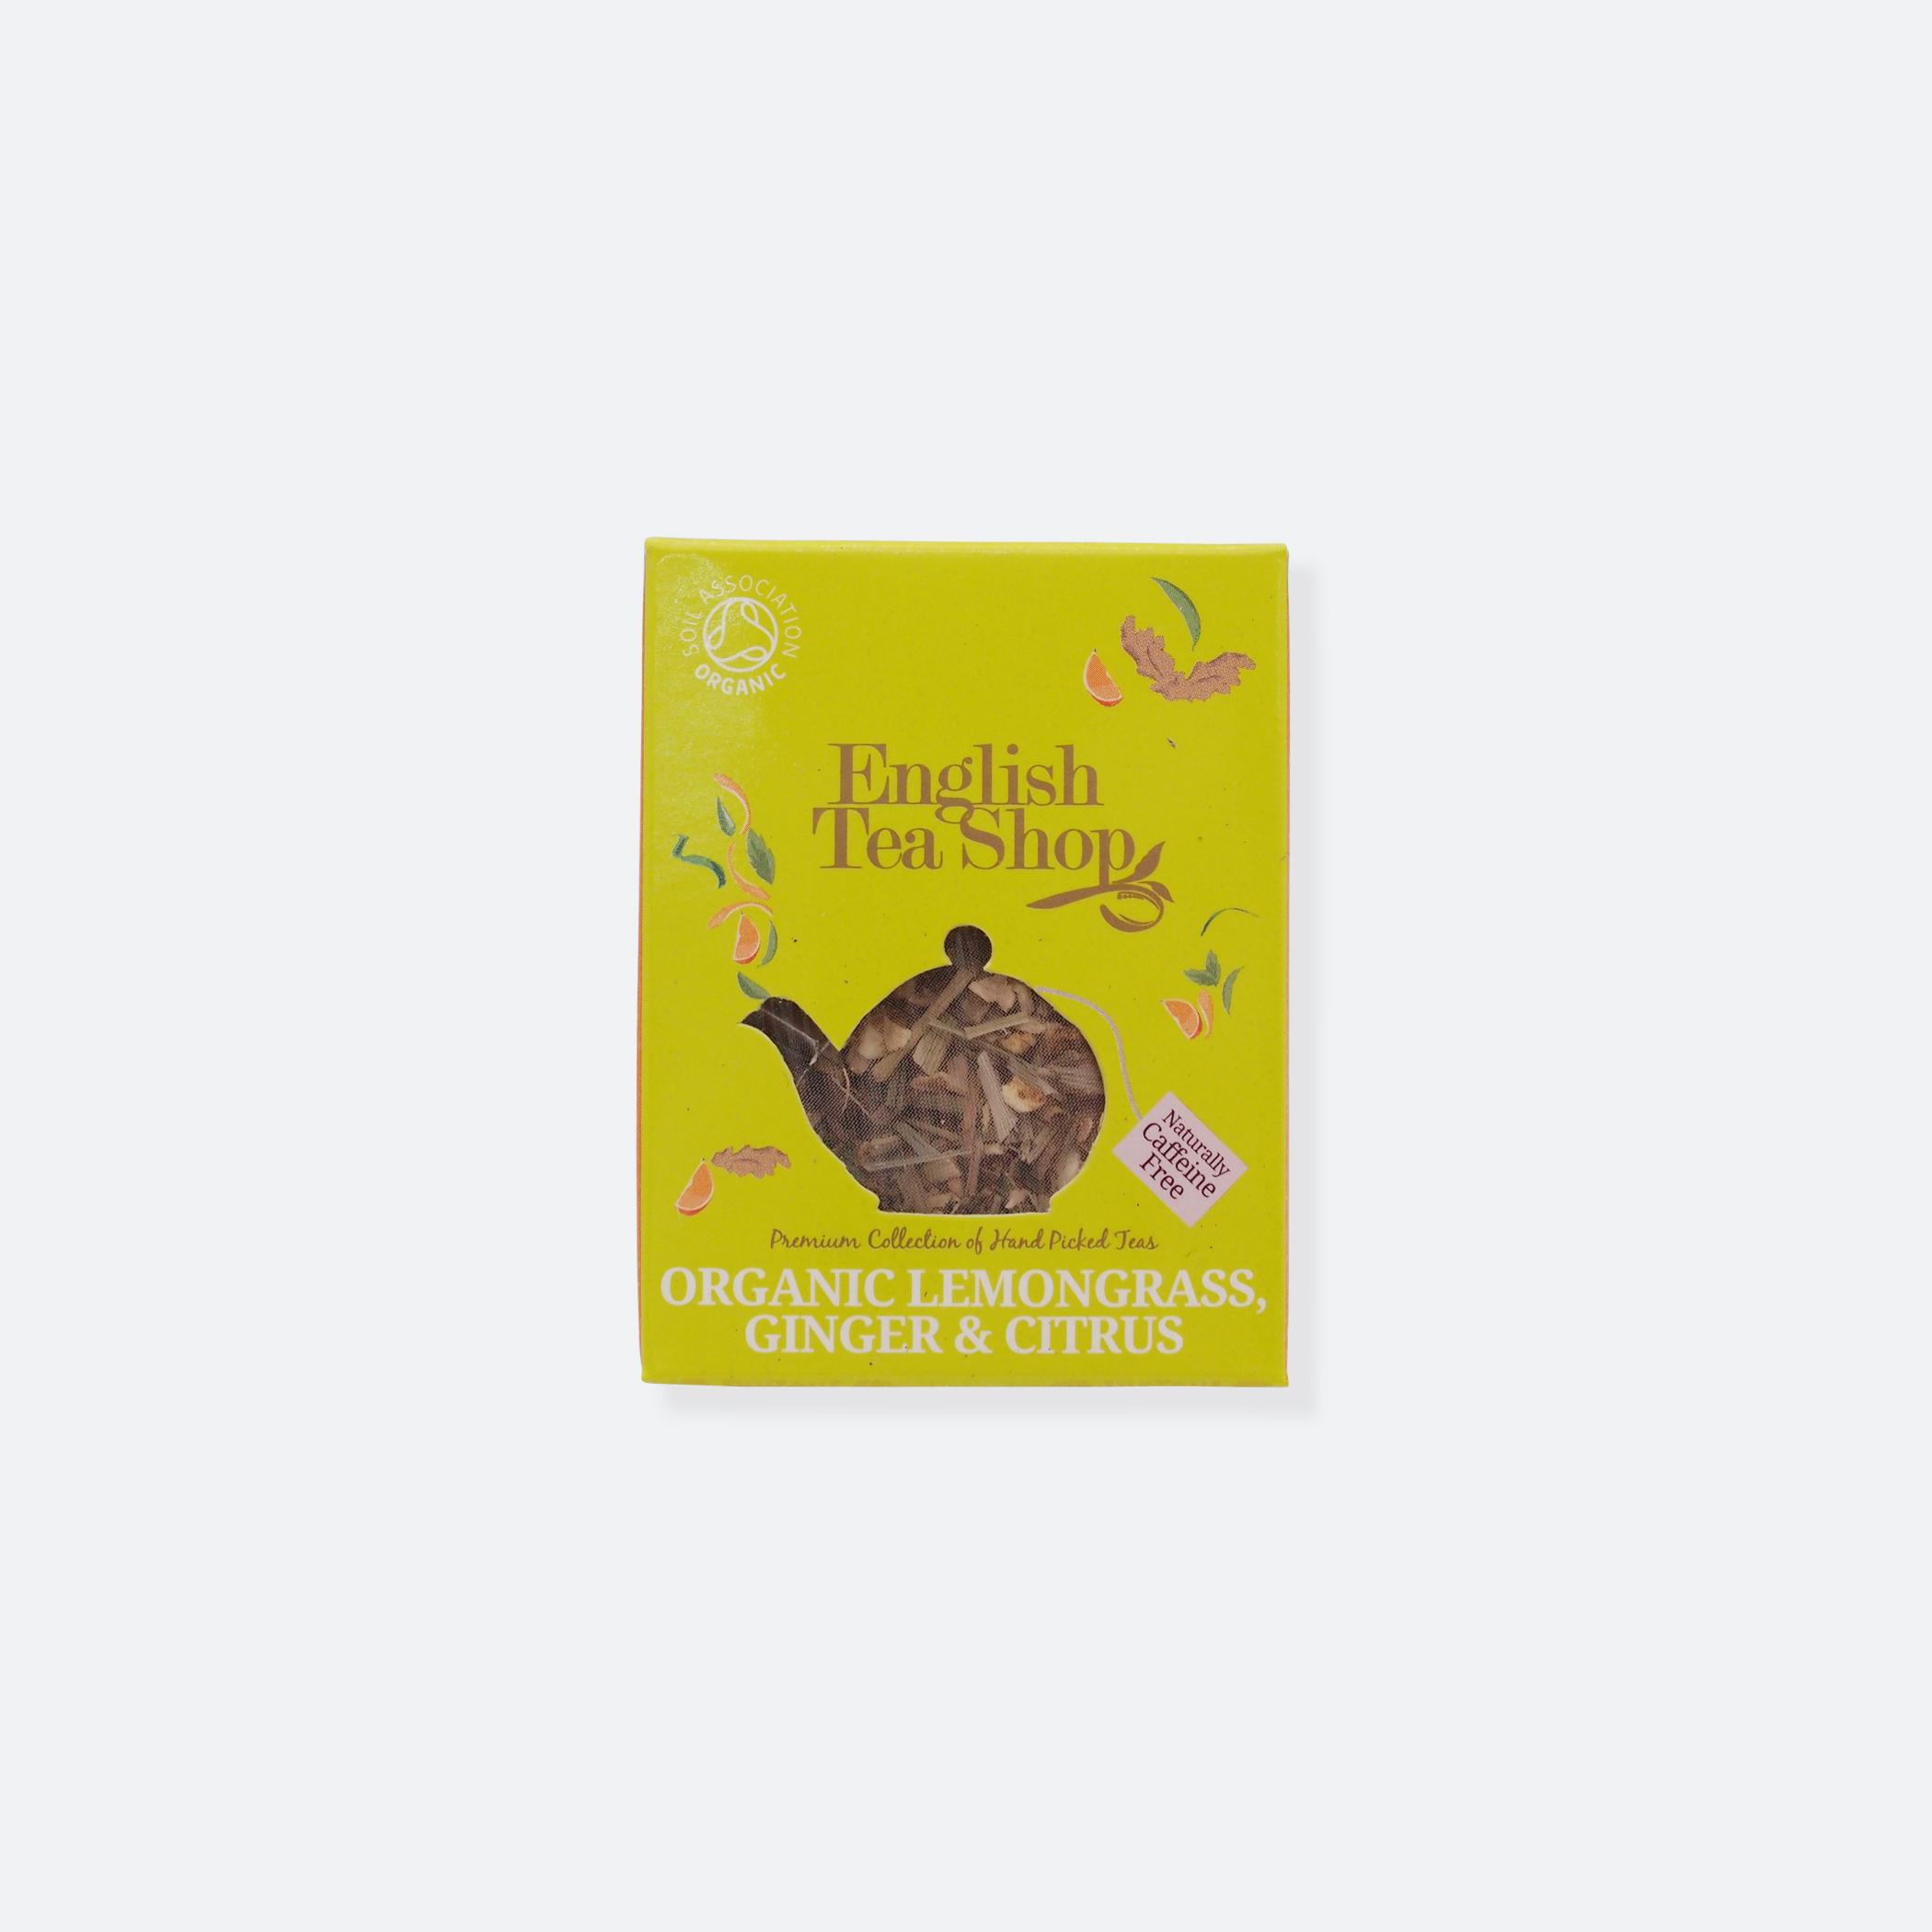 OhMart English Tea Shop - Organic Lemongrass Ginger & Citrus 1